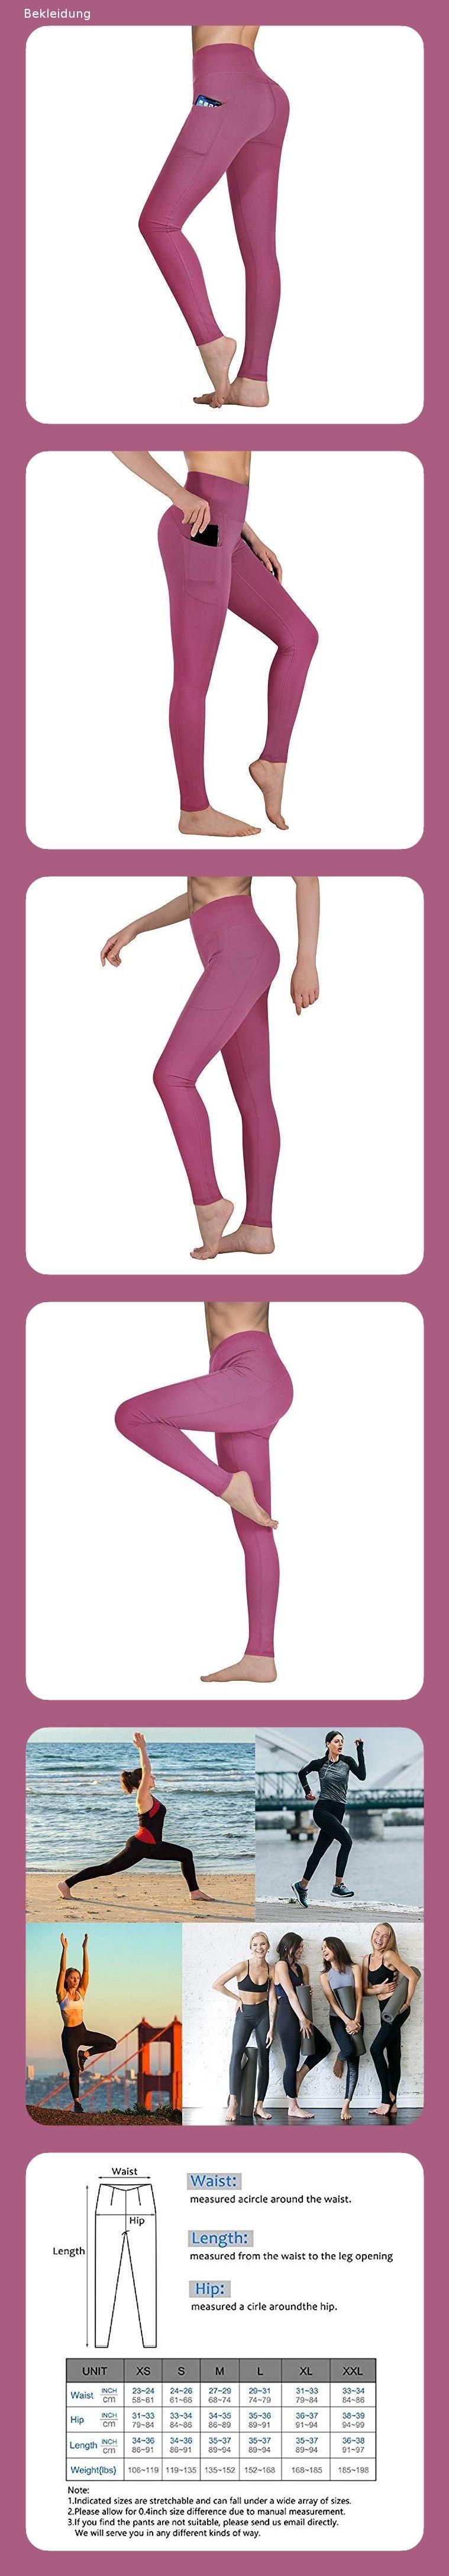 Occffy Sporthose Damen Yogahose Laufhose Fitnesshose Yoga Sport Leggings tights f/ür Damen mit Taschen DS166